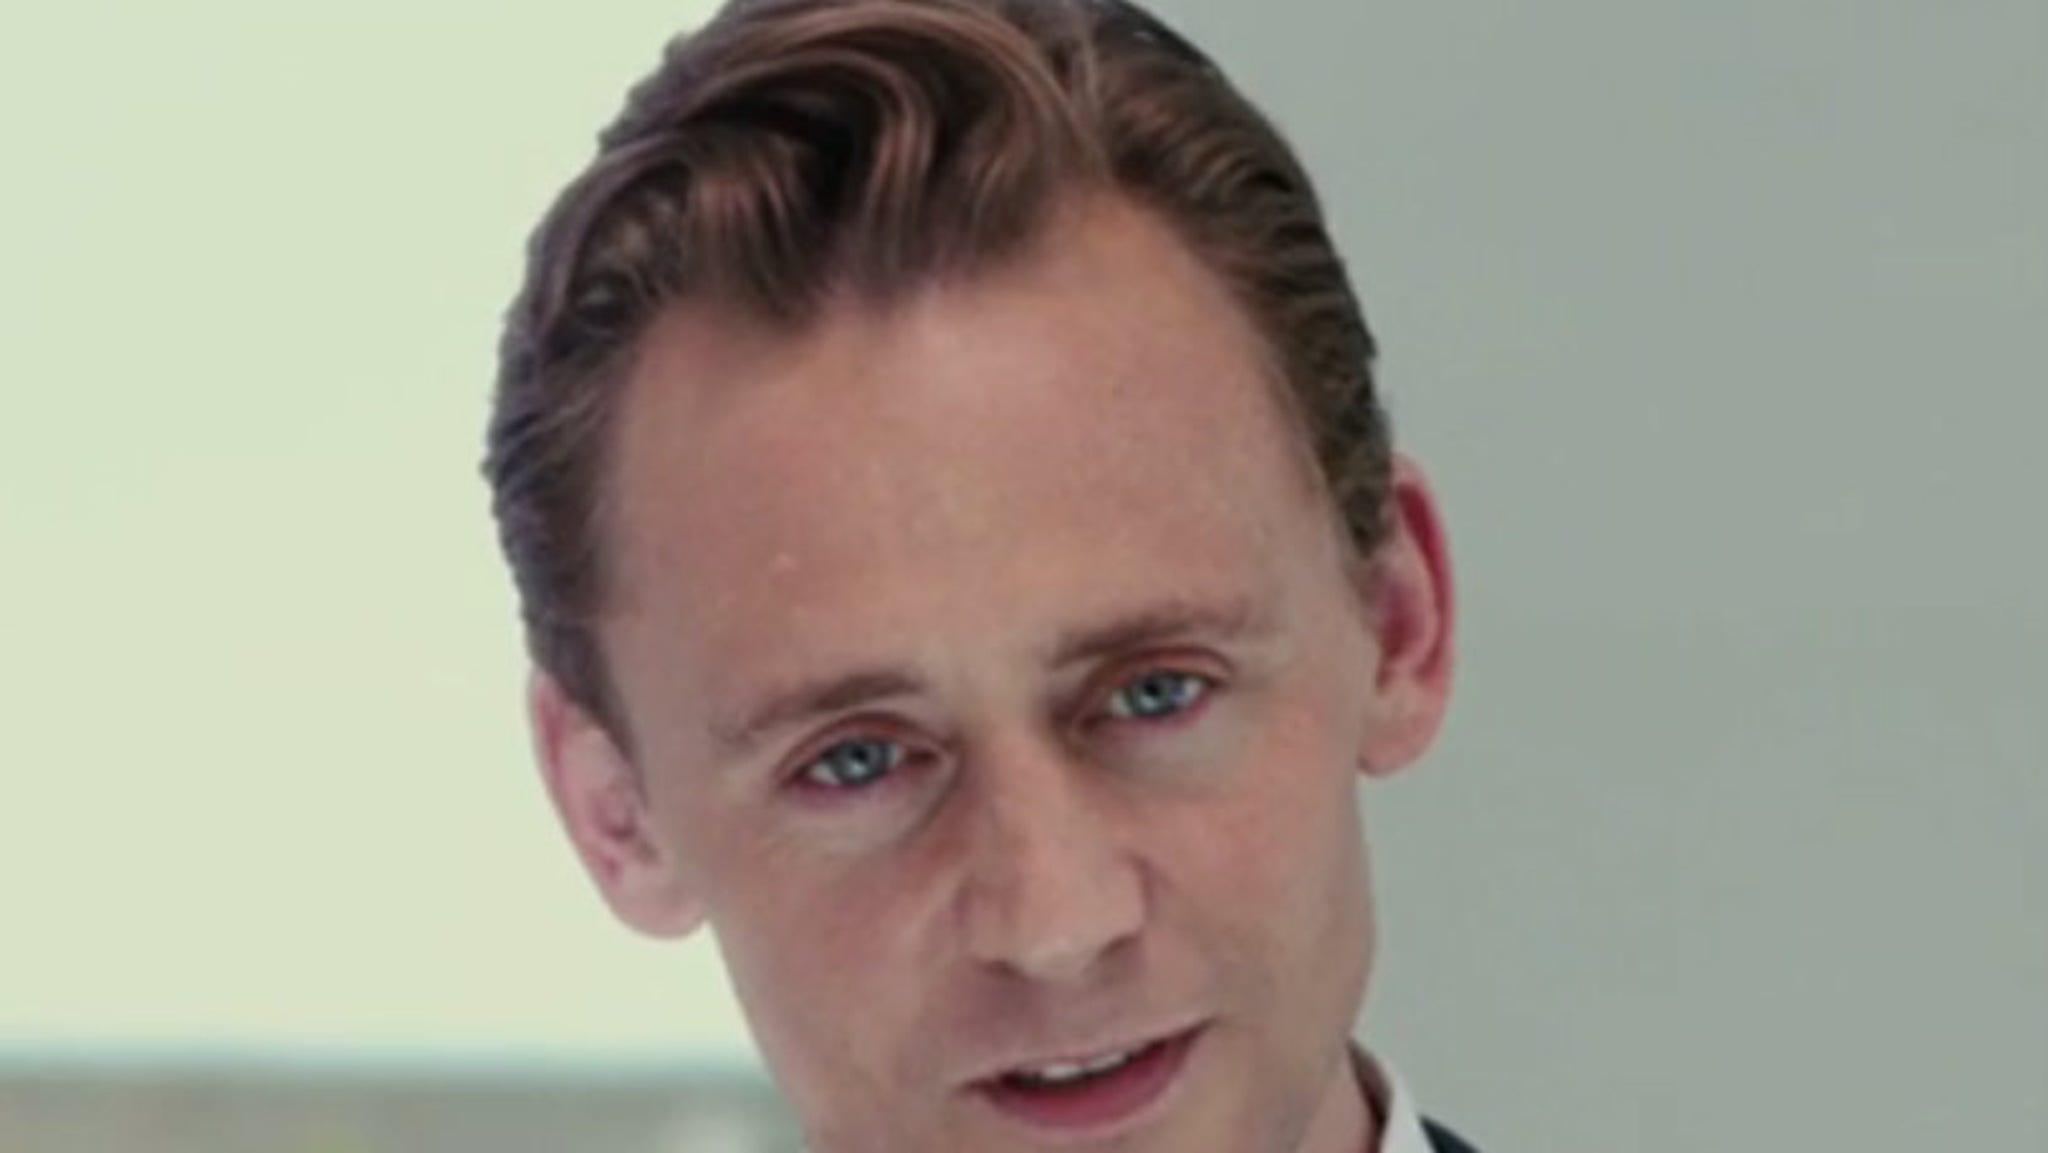 Tom Hiddleston Is an Excellent Specimen in High-Rise